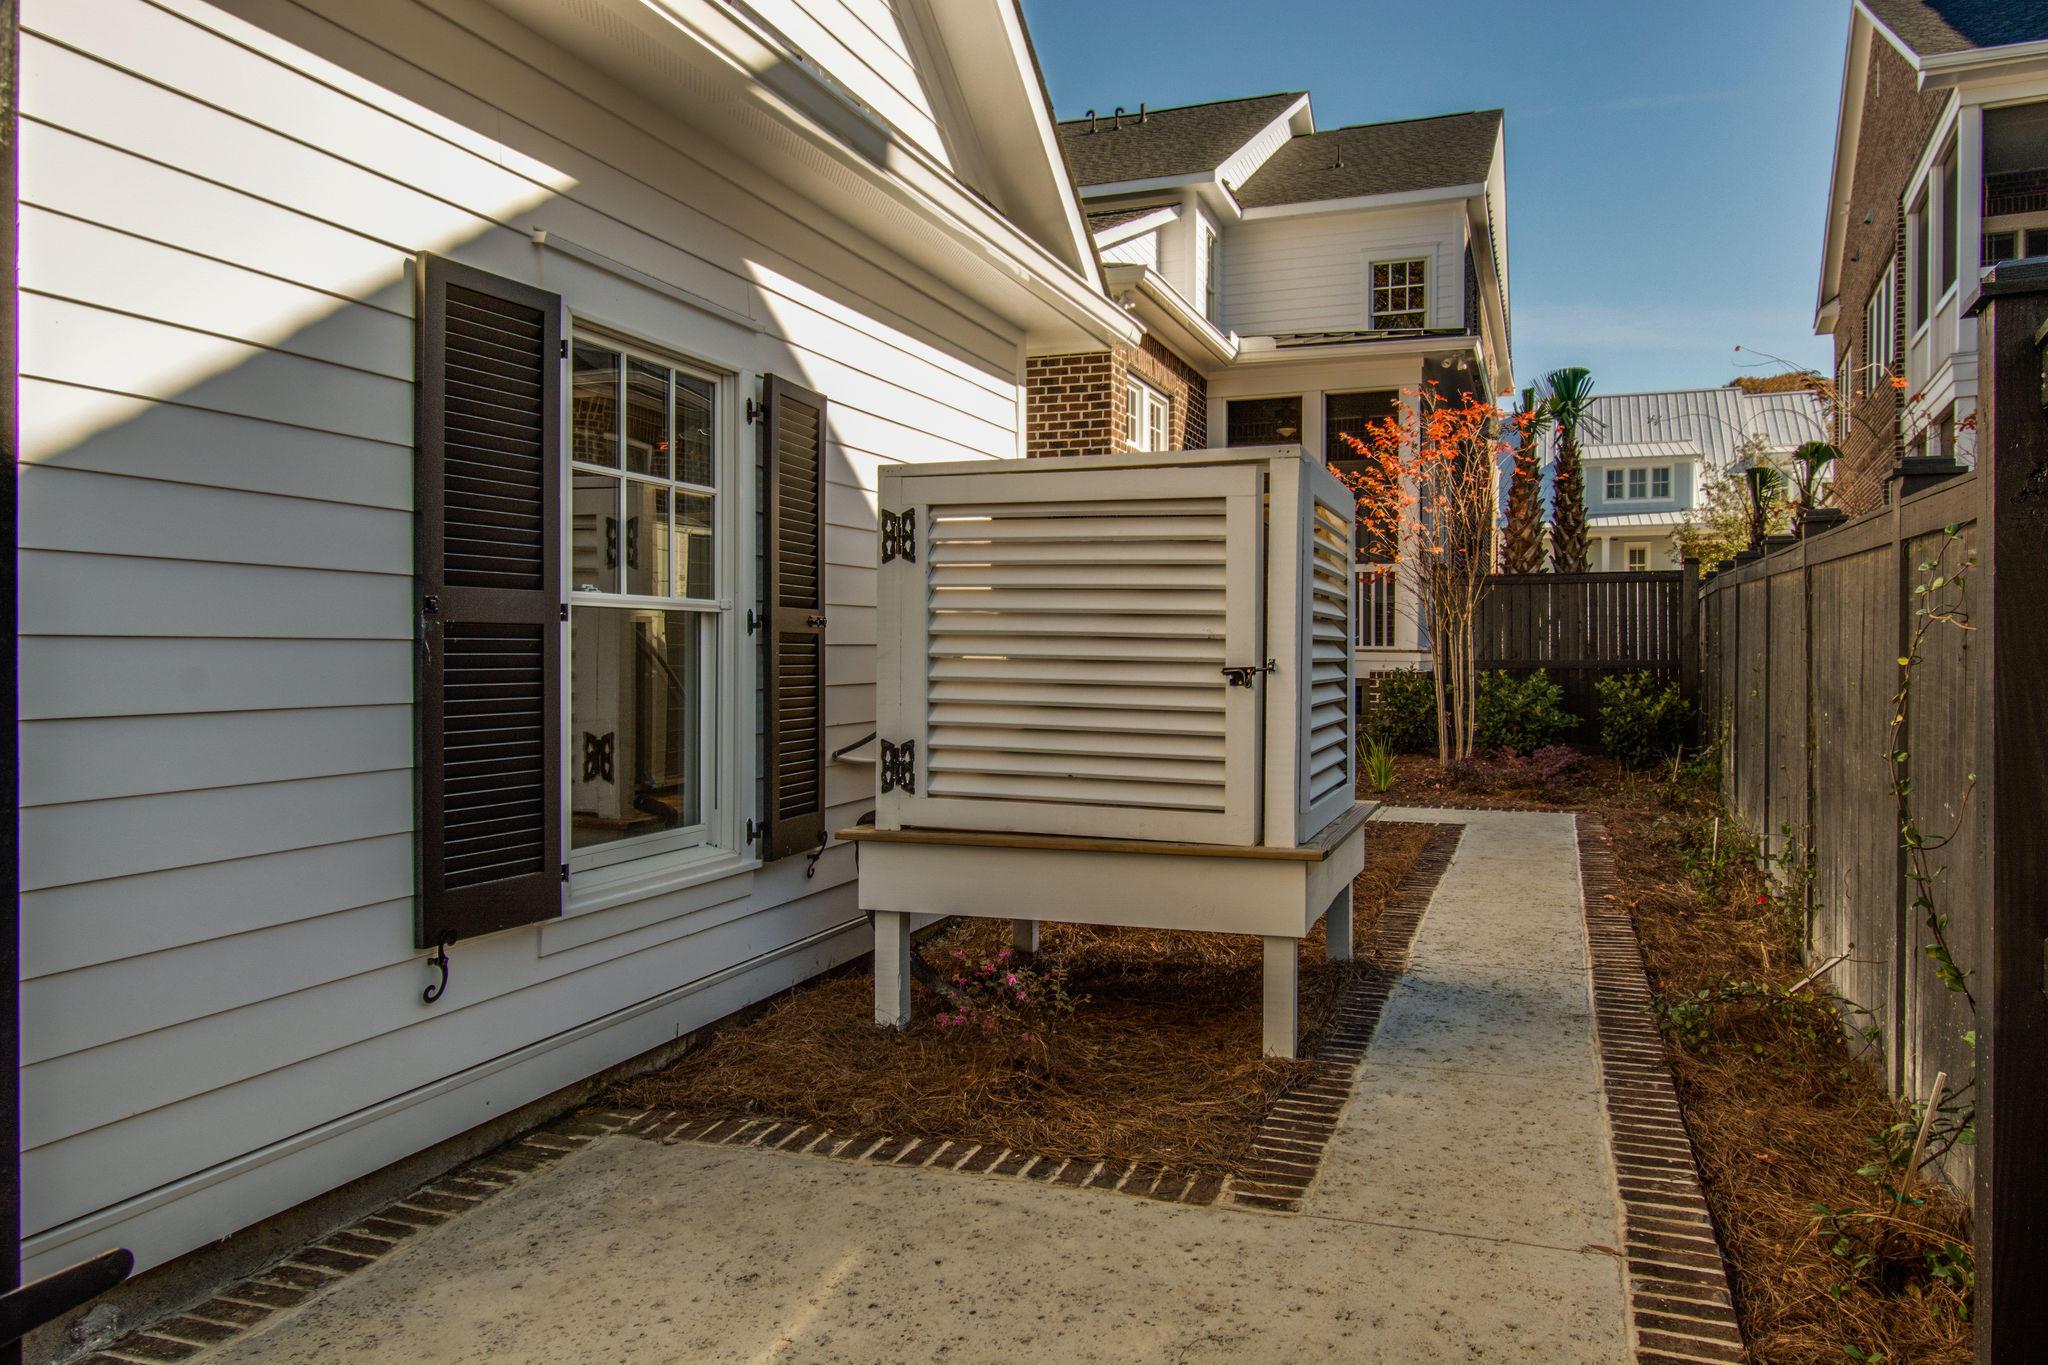 Daniel Island Park Homes For Sale - 112 Brailsford, Charleston, SC - 2